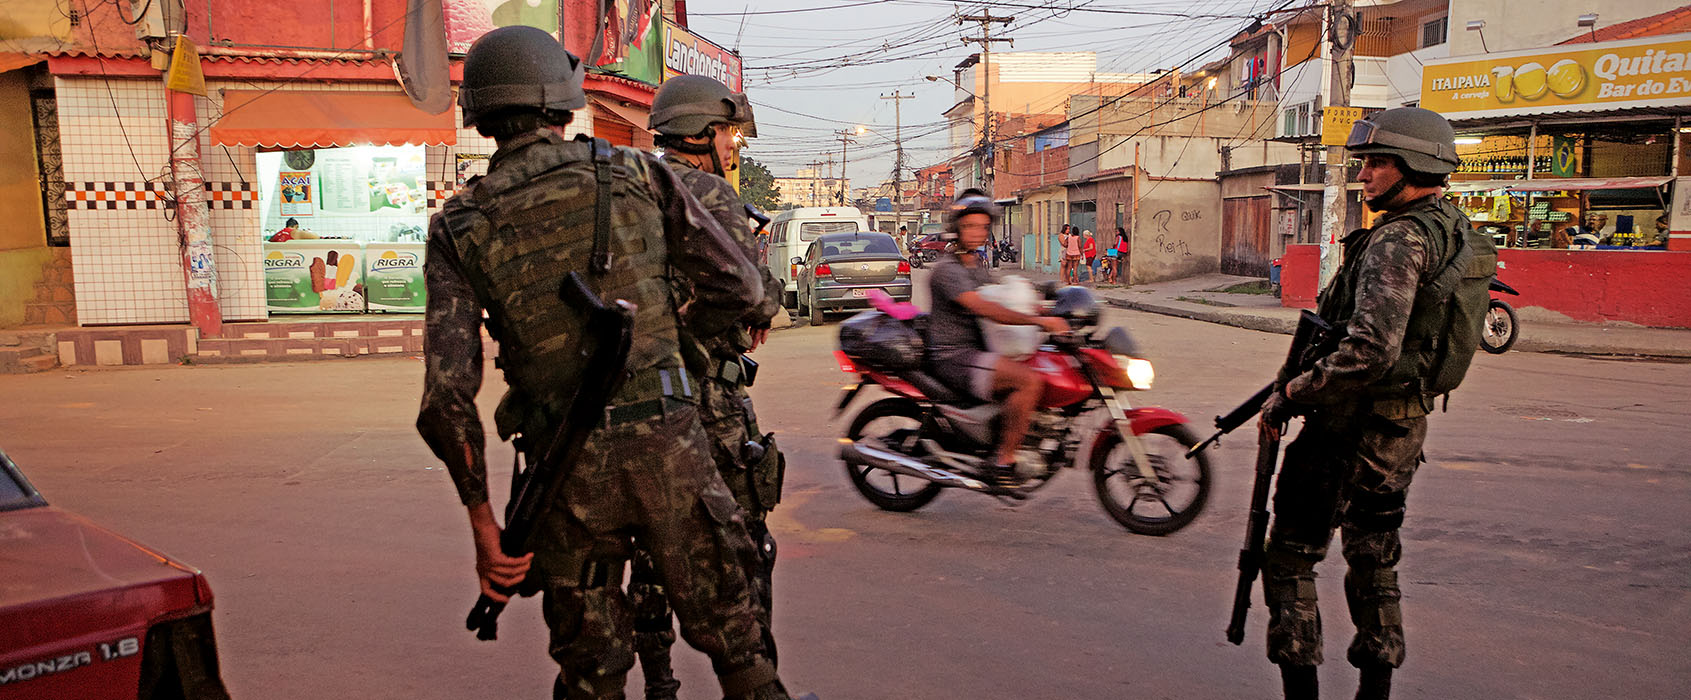 mvg_Rio_#33_Militar_scooter